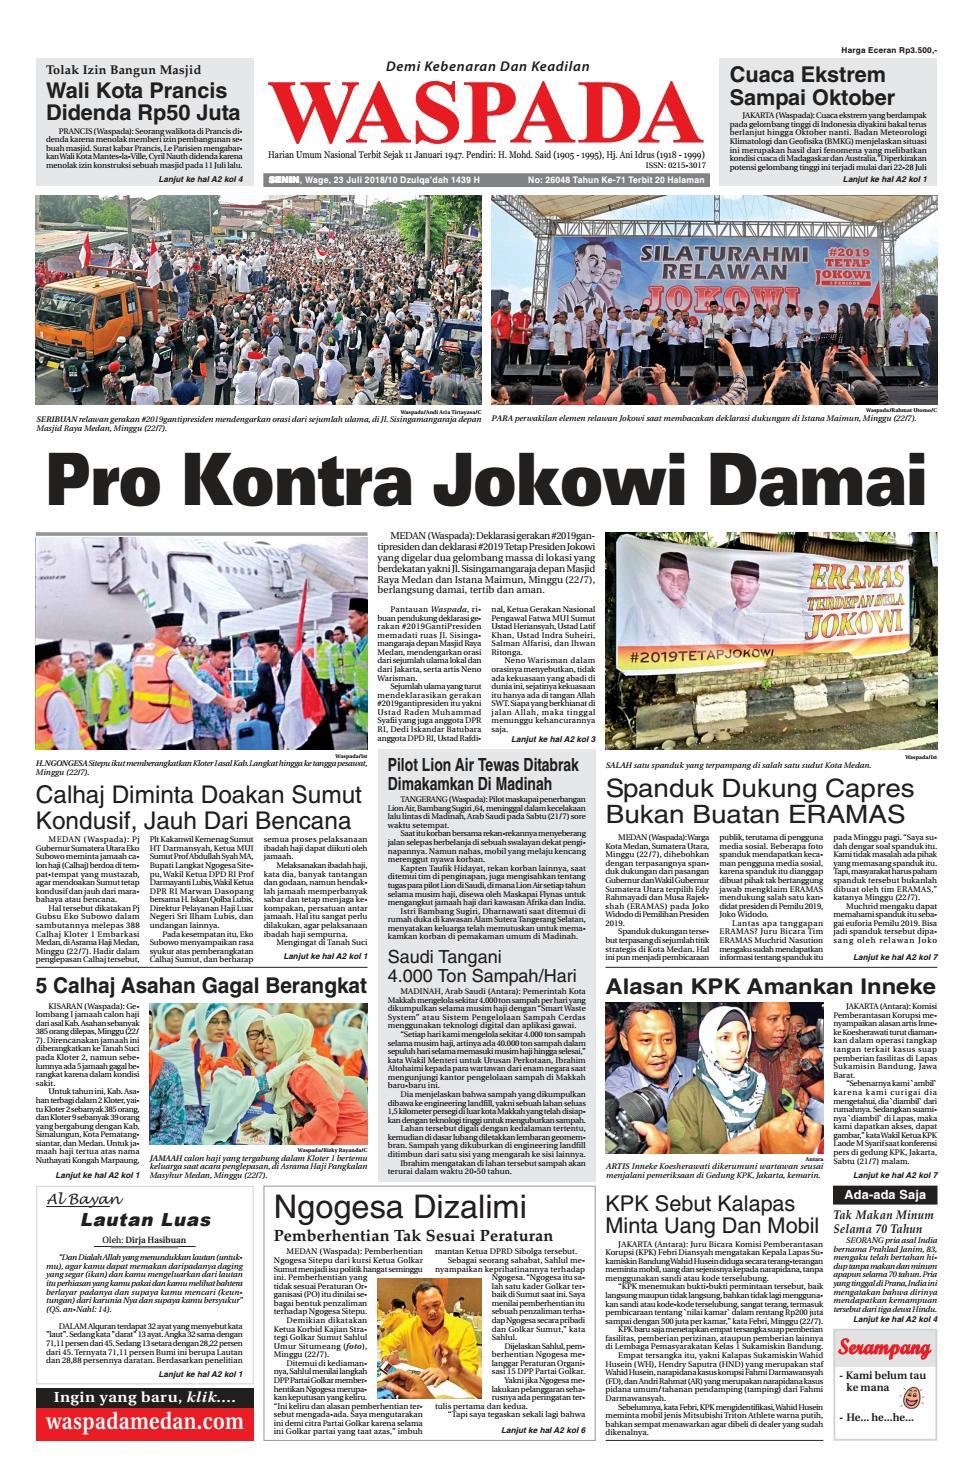 Waspada Senin 23 Juli 2018 By Harian Issuu Tcash Vaganza 37 Kran Tembok Kuningan Tr 5j F